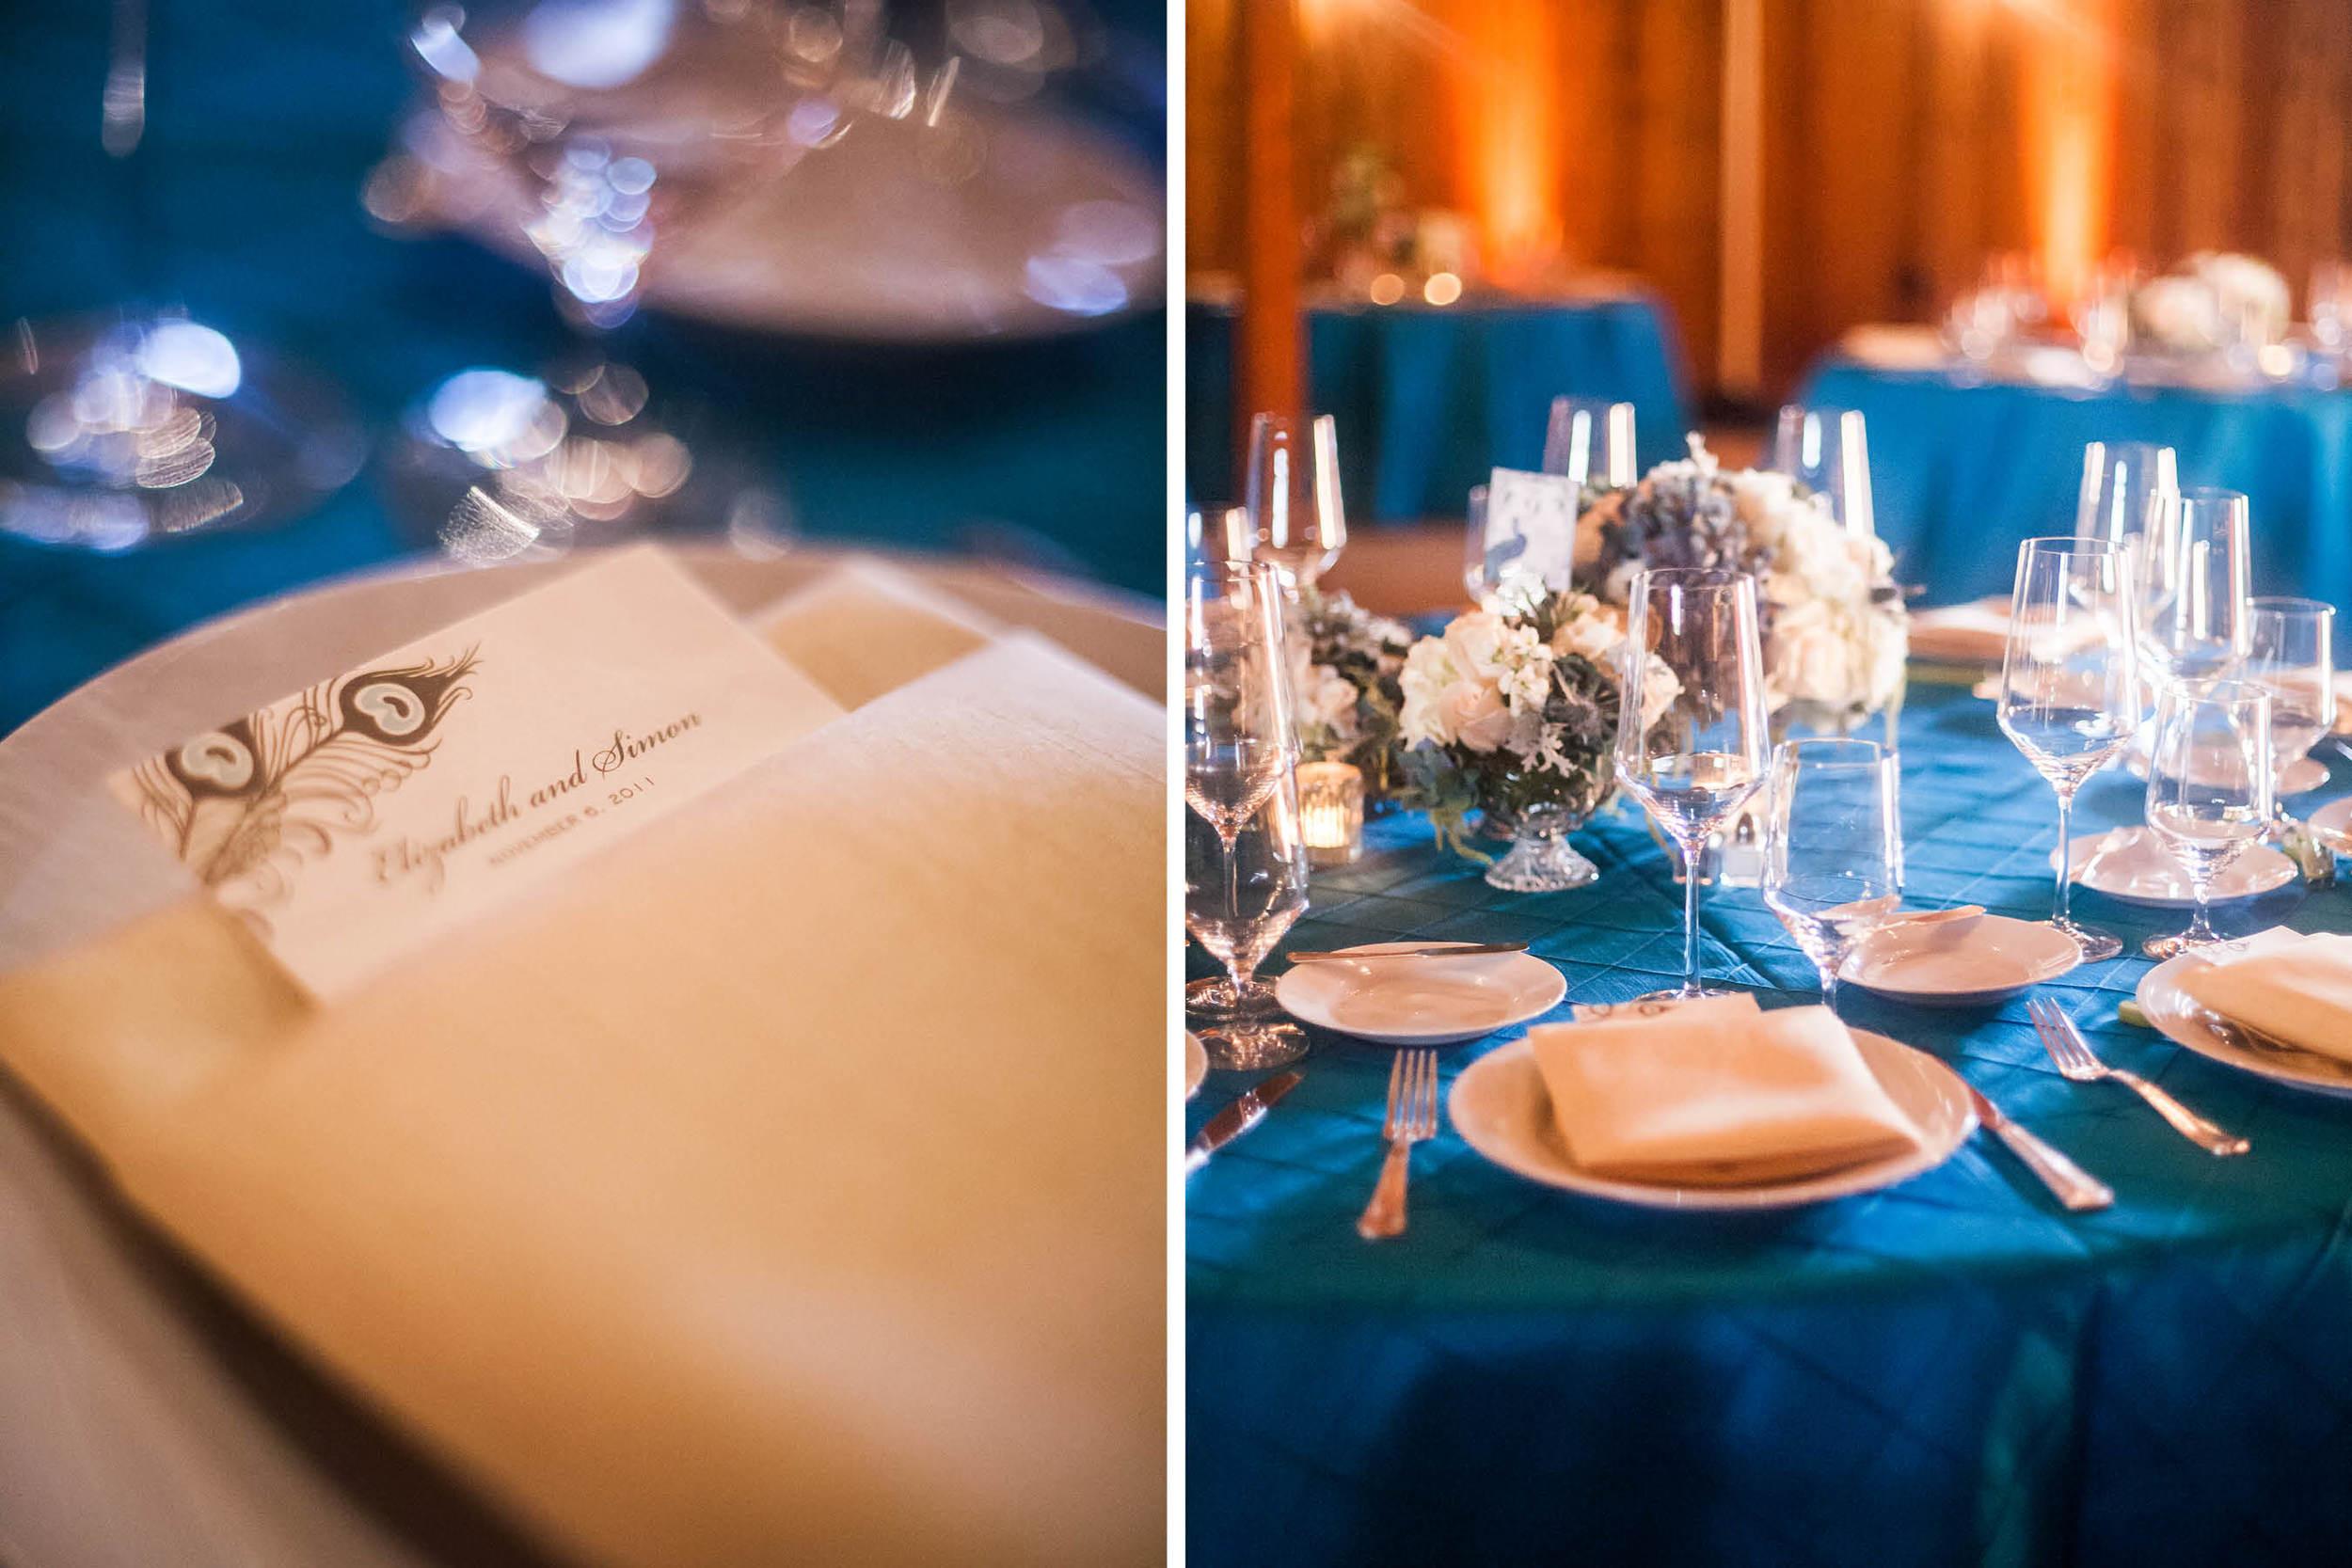 tres-hermanas-winery-vineyard-wedding-planner-coordinator-santa-barbara-ynez-maria (16).jpg